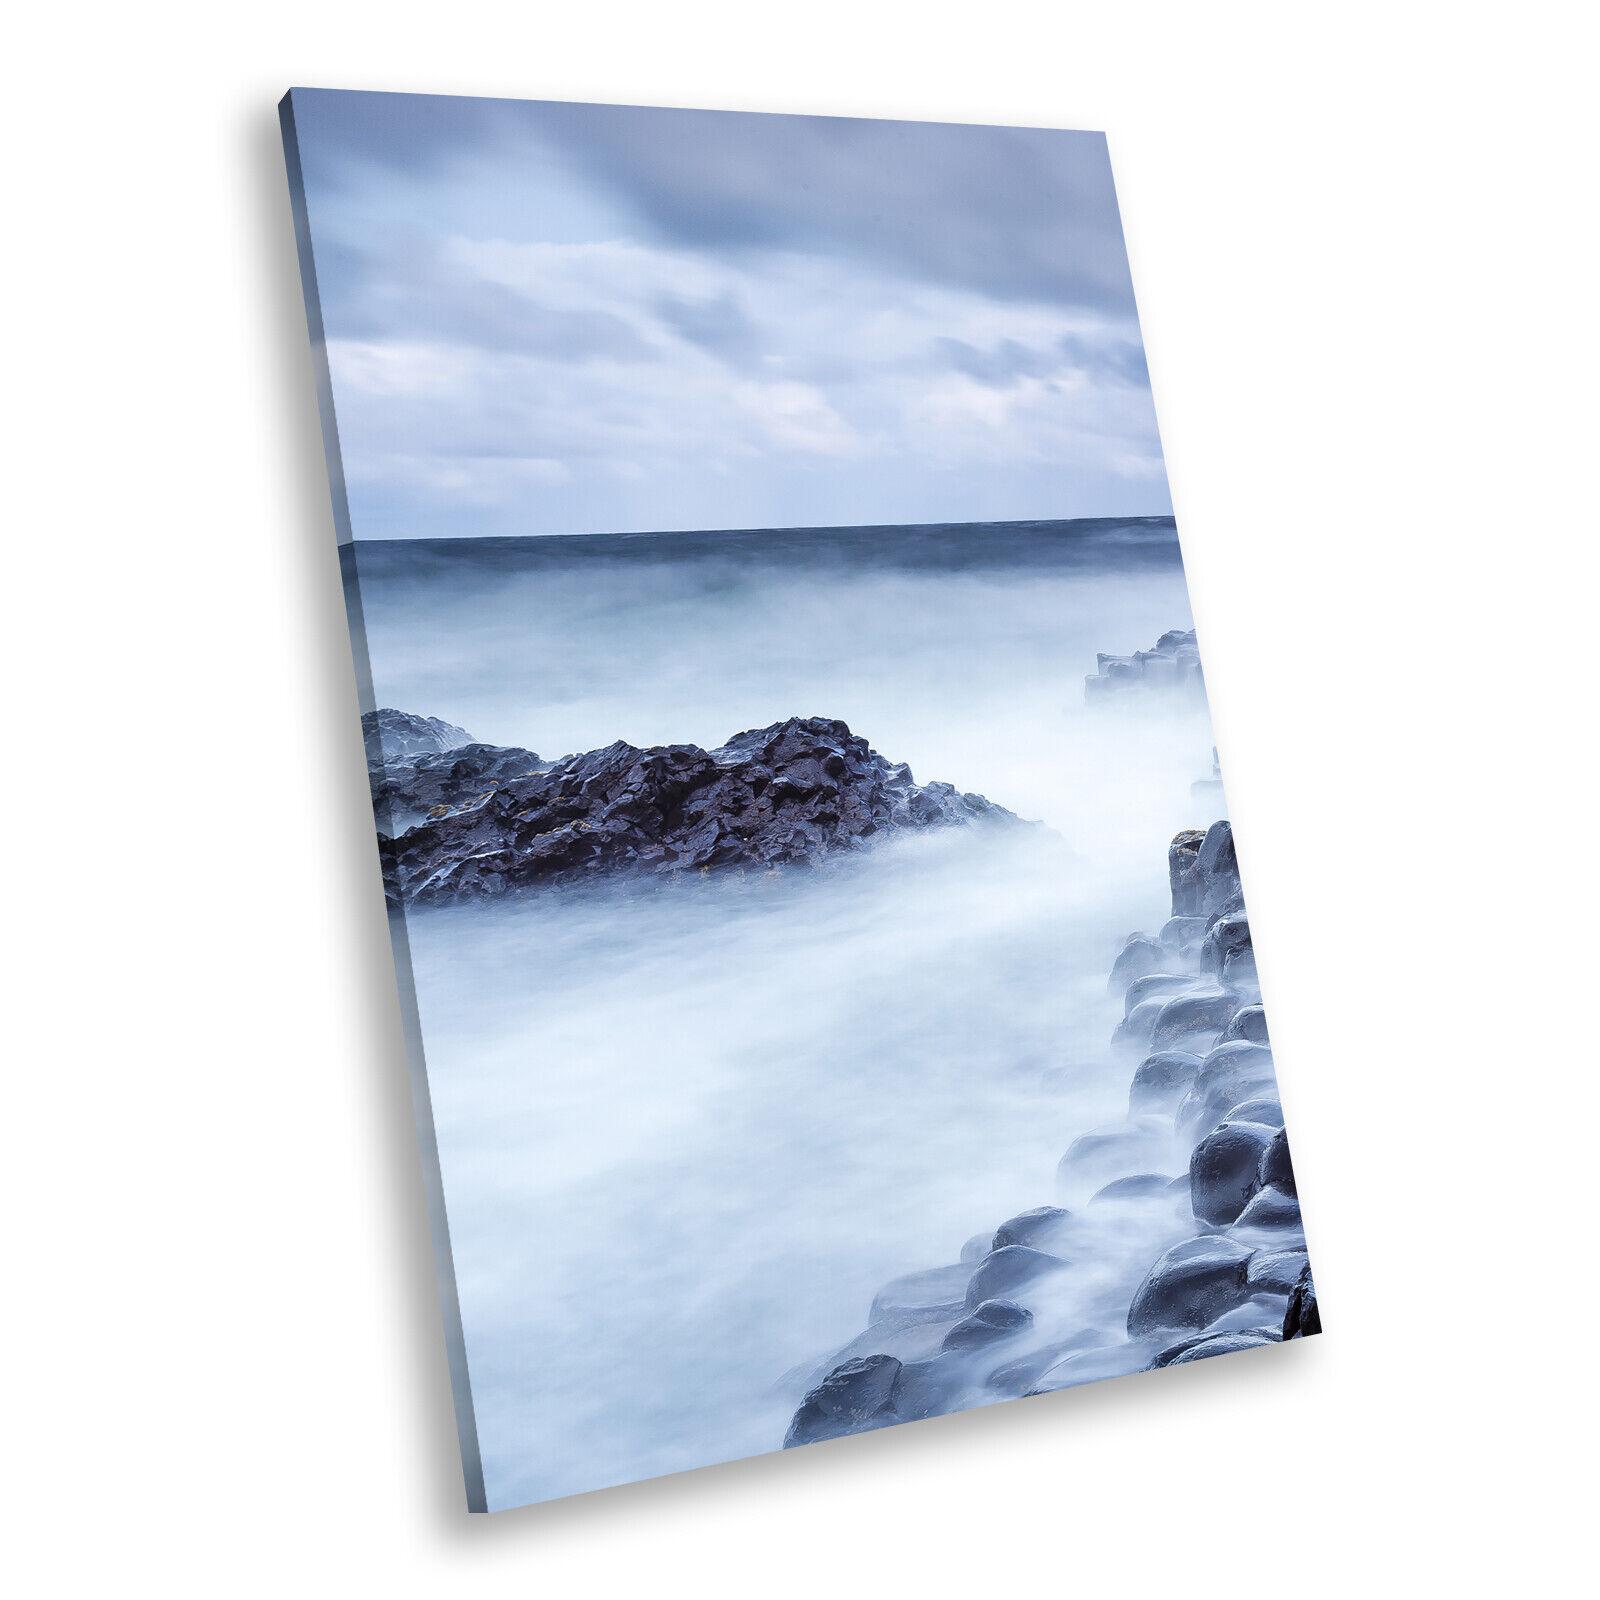 Blau Giants Causeway Ireland Portrait Scenic Canvas Wall Art Picture Prints